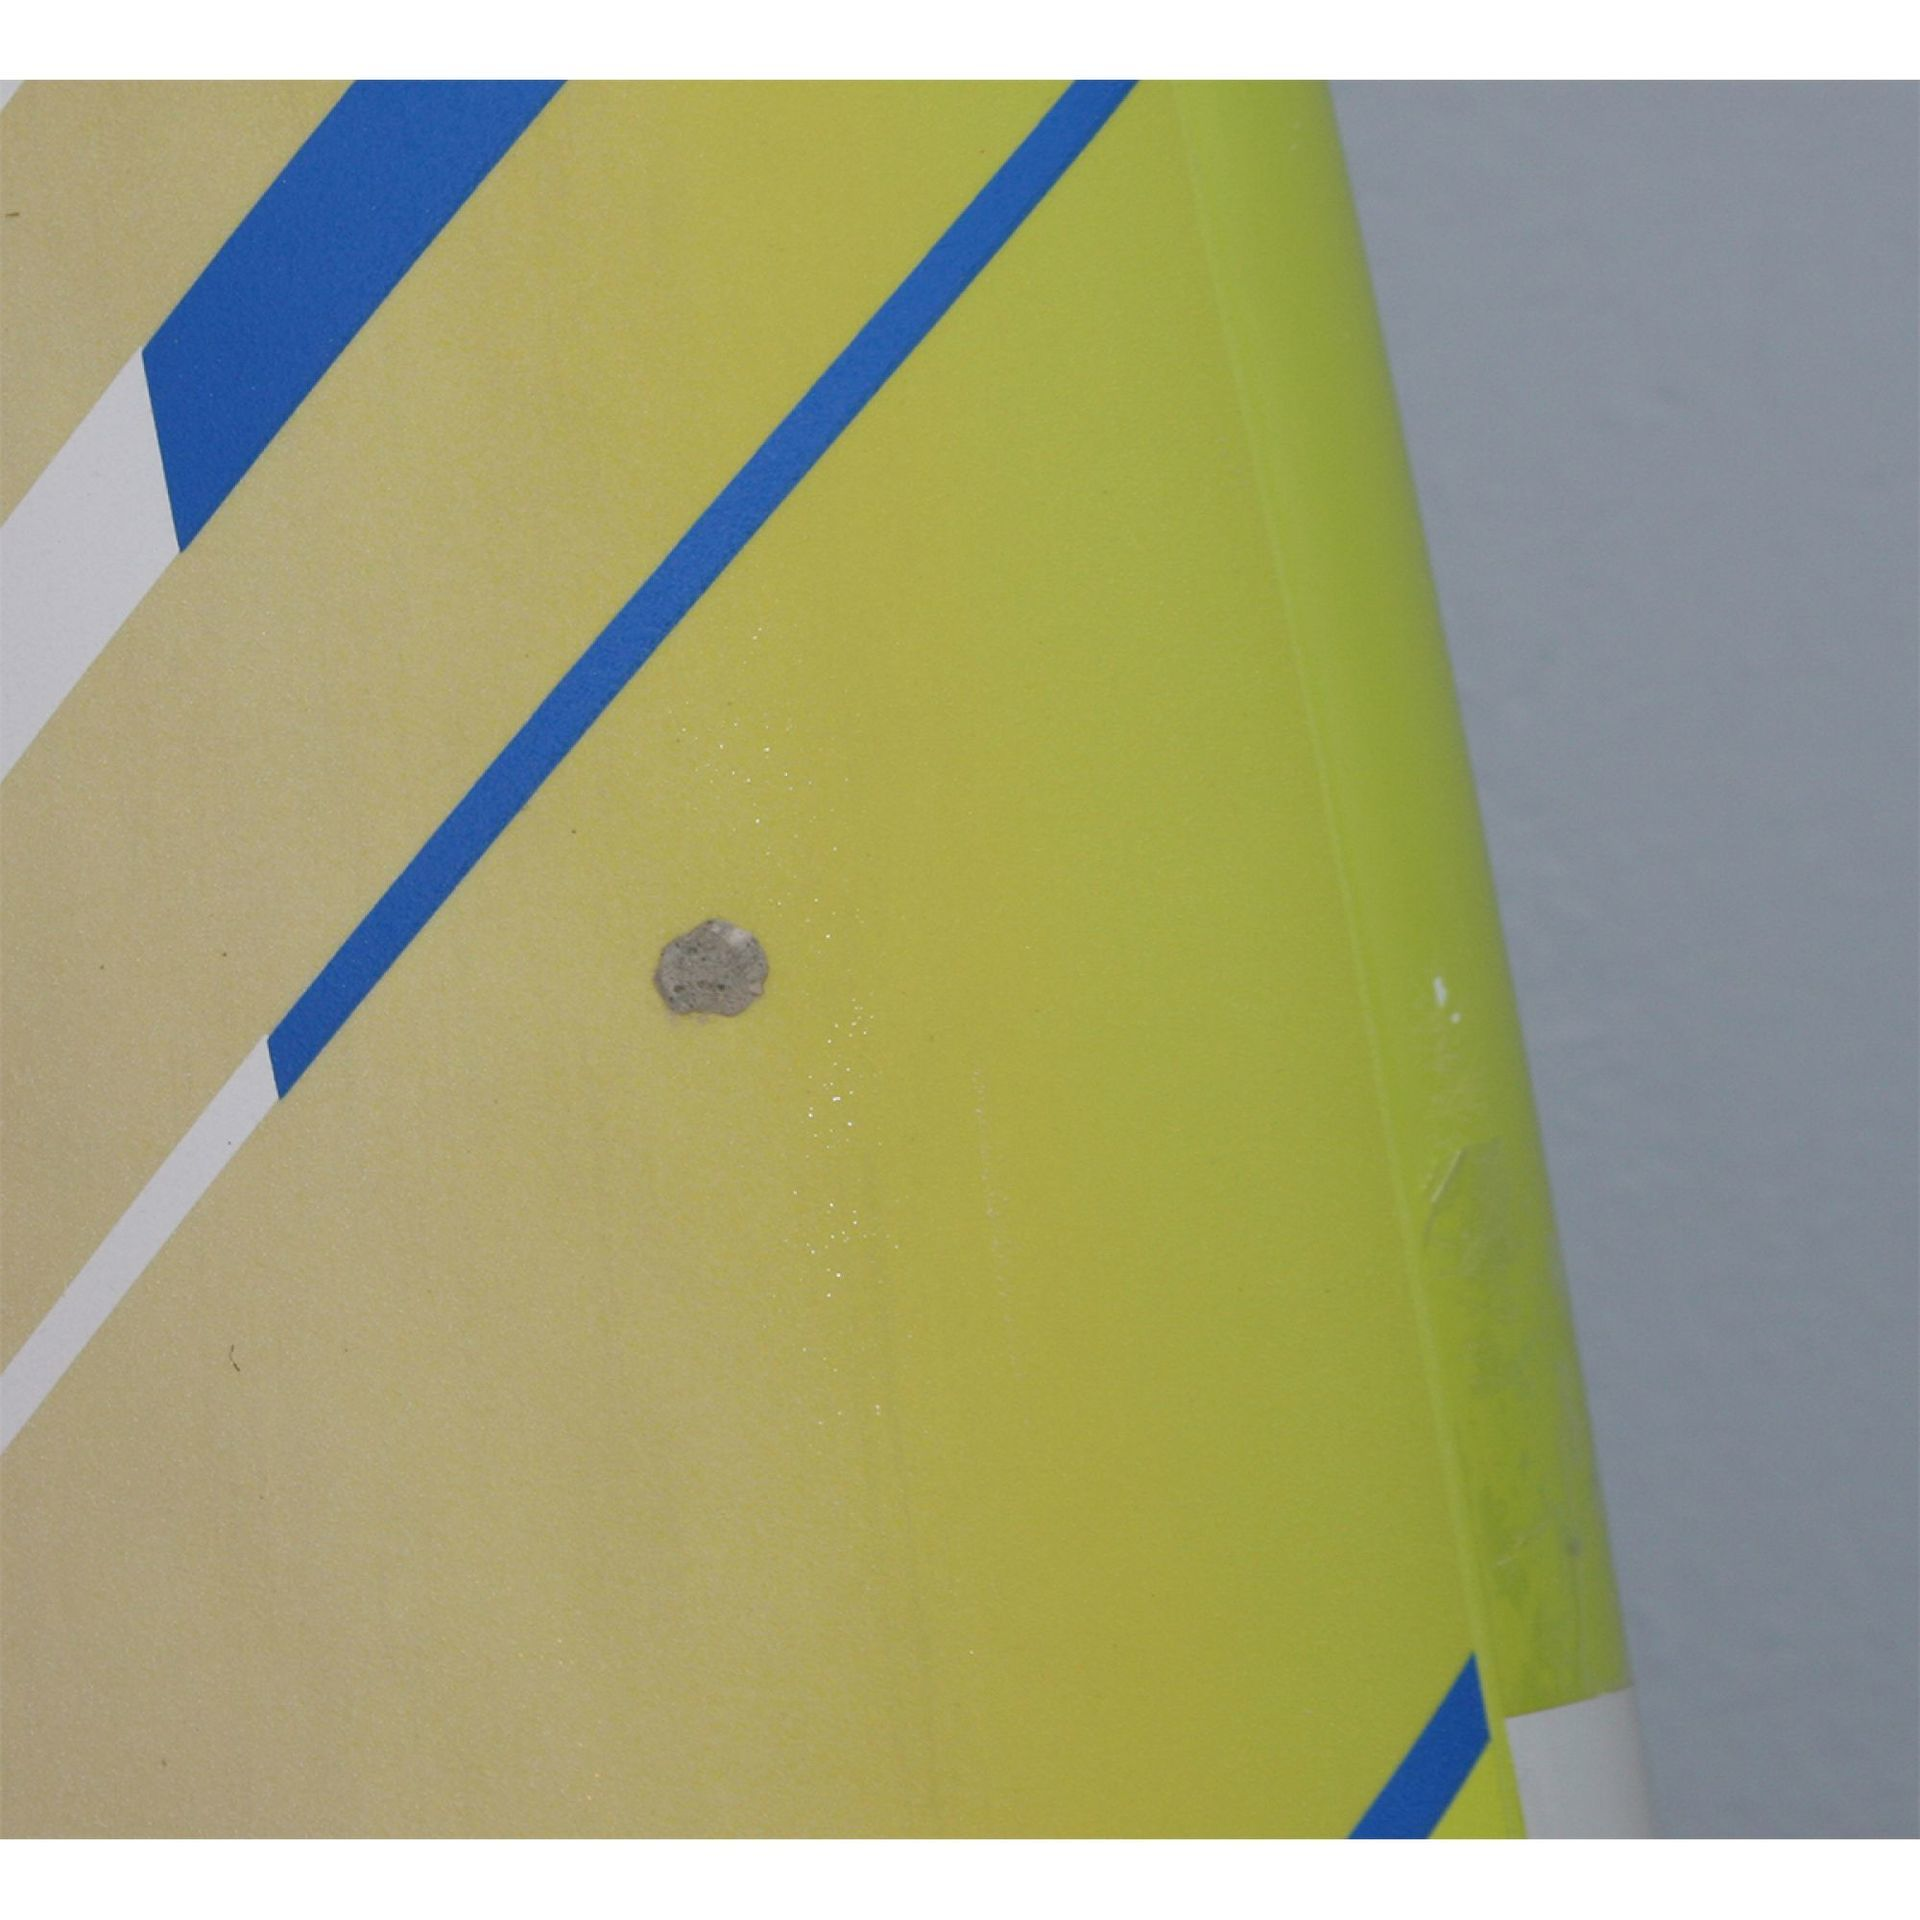 DESKA WINDSURFINGOWA JP # X-CITE RIDE # FWS 2014 160 2